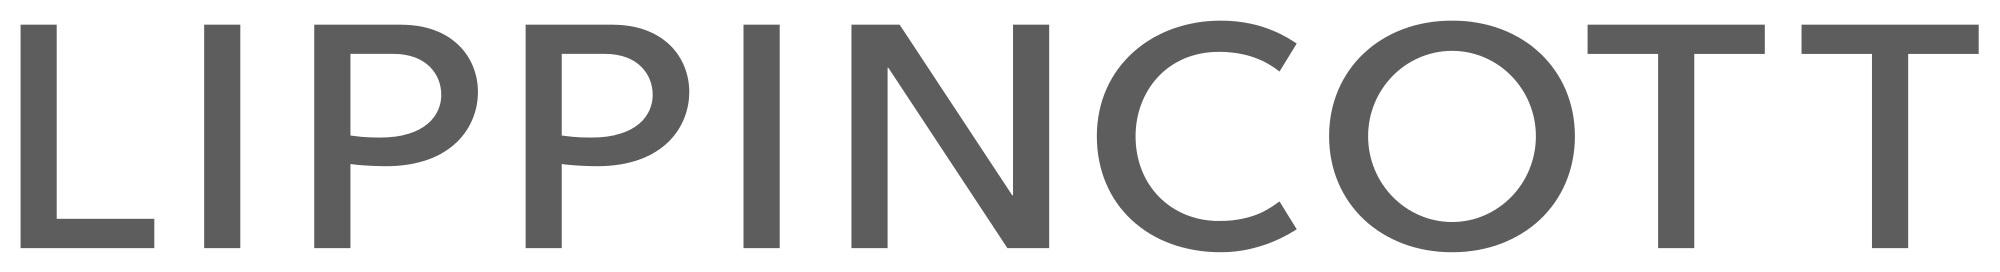 Lippincott-logo.JPG